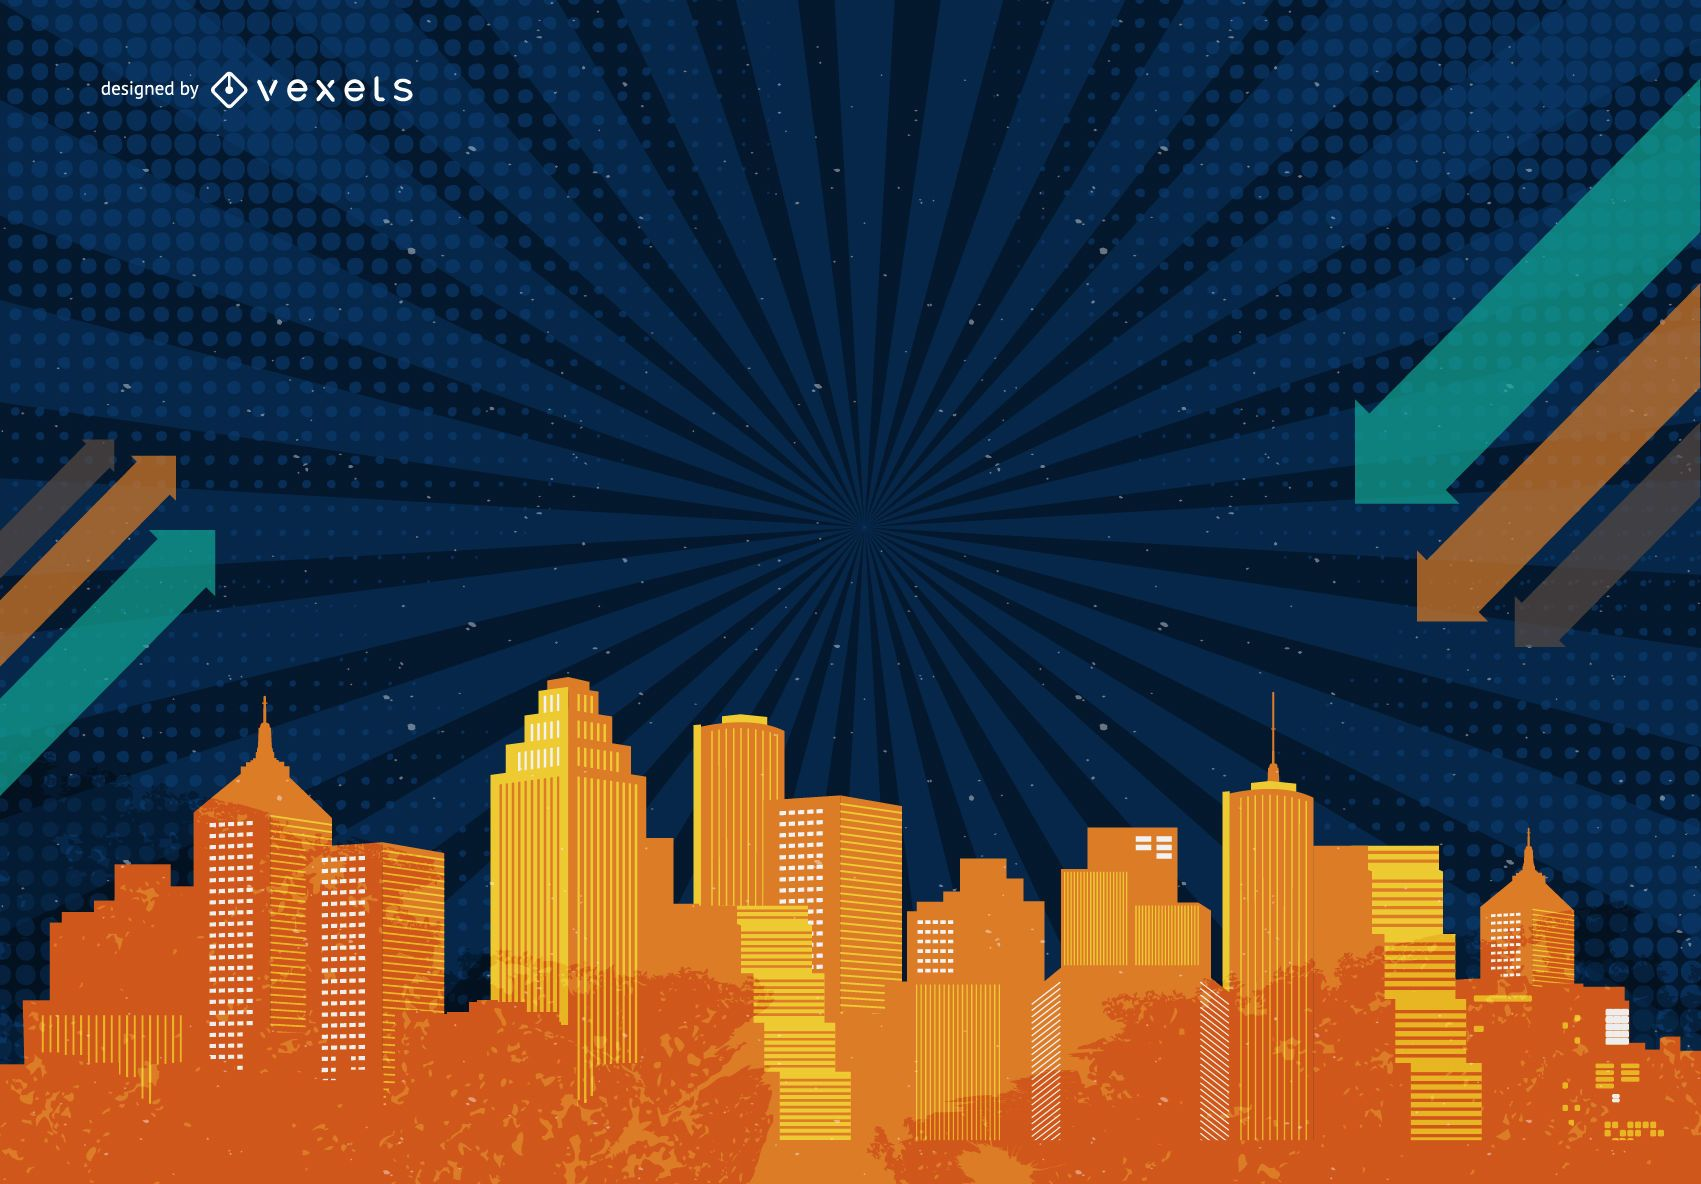 Abstract city illustration